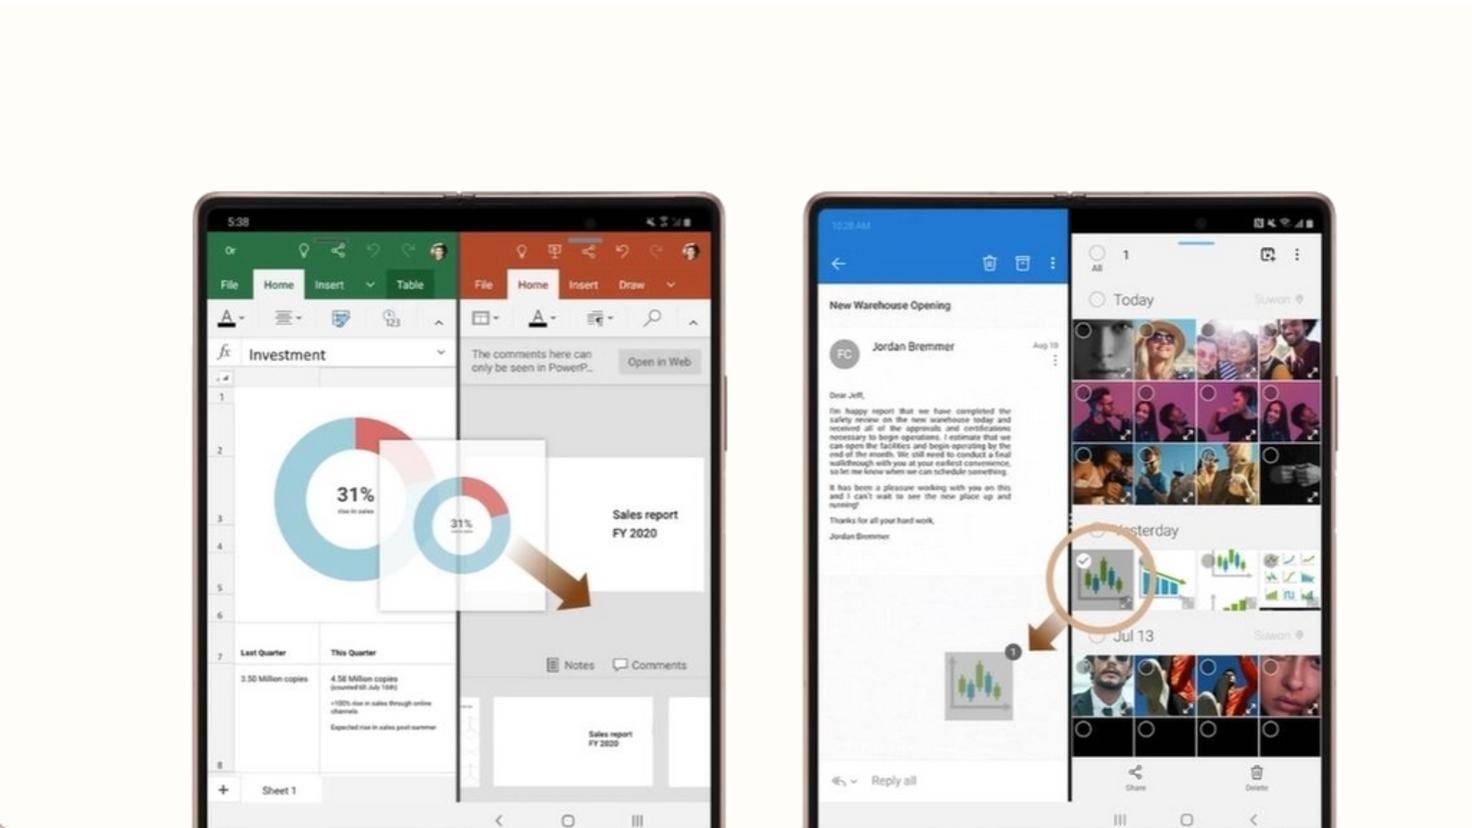 Galaxy-Z-Fold2-Flex-Share-Apps-v2